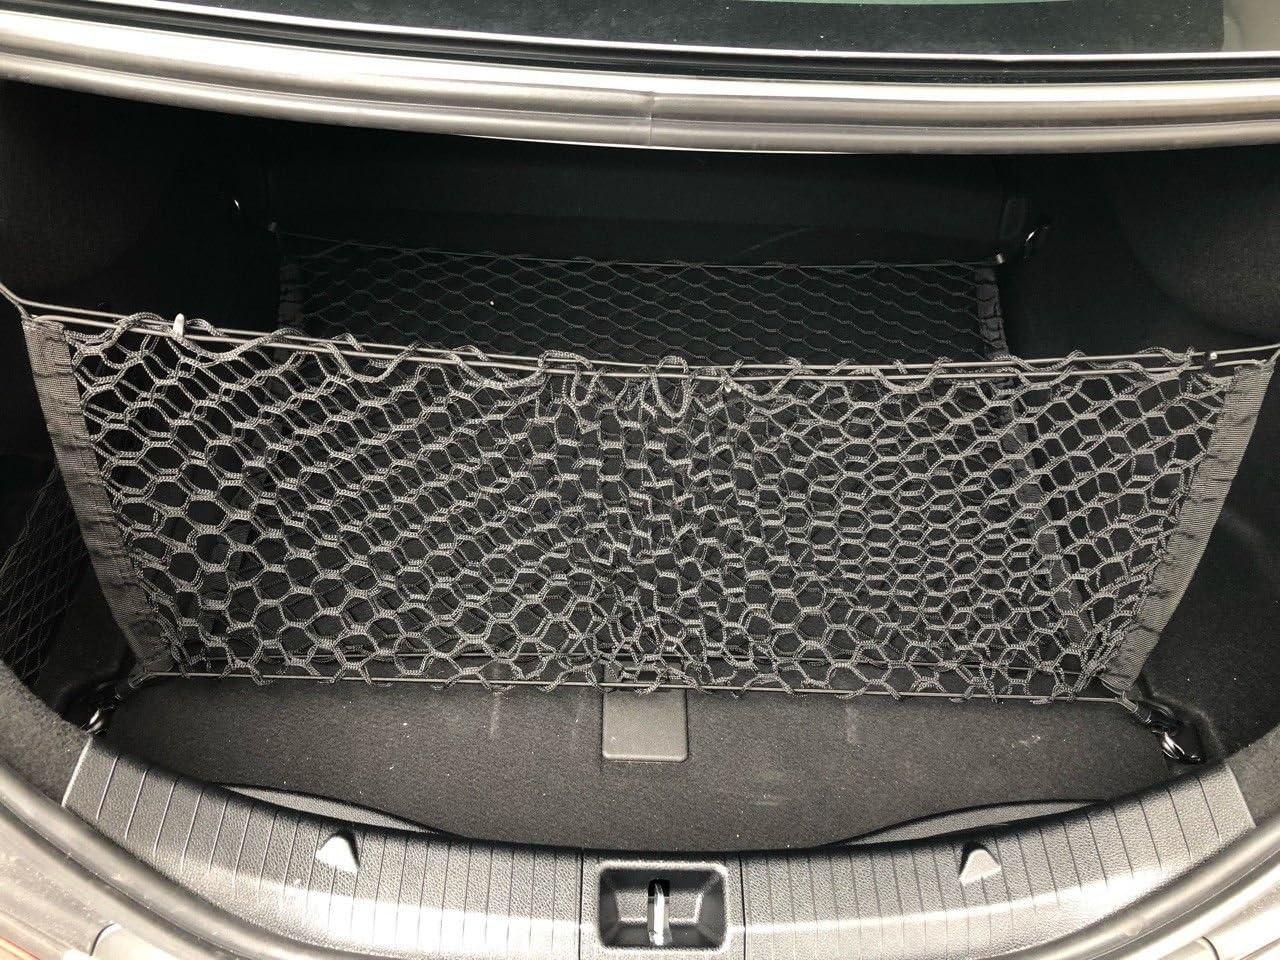 TrunkNets Inc Floor Style Trunk Cargo Net for MERCEDES BENZ CLA180 CLA200 CLA250 CLA45 AMG 2013 14 15 16 17 18 2019 NEW